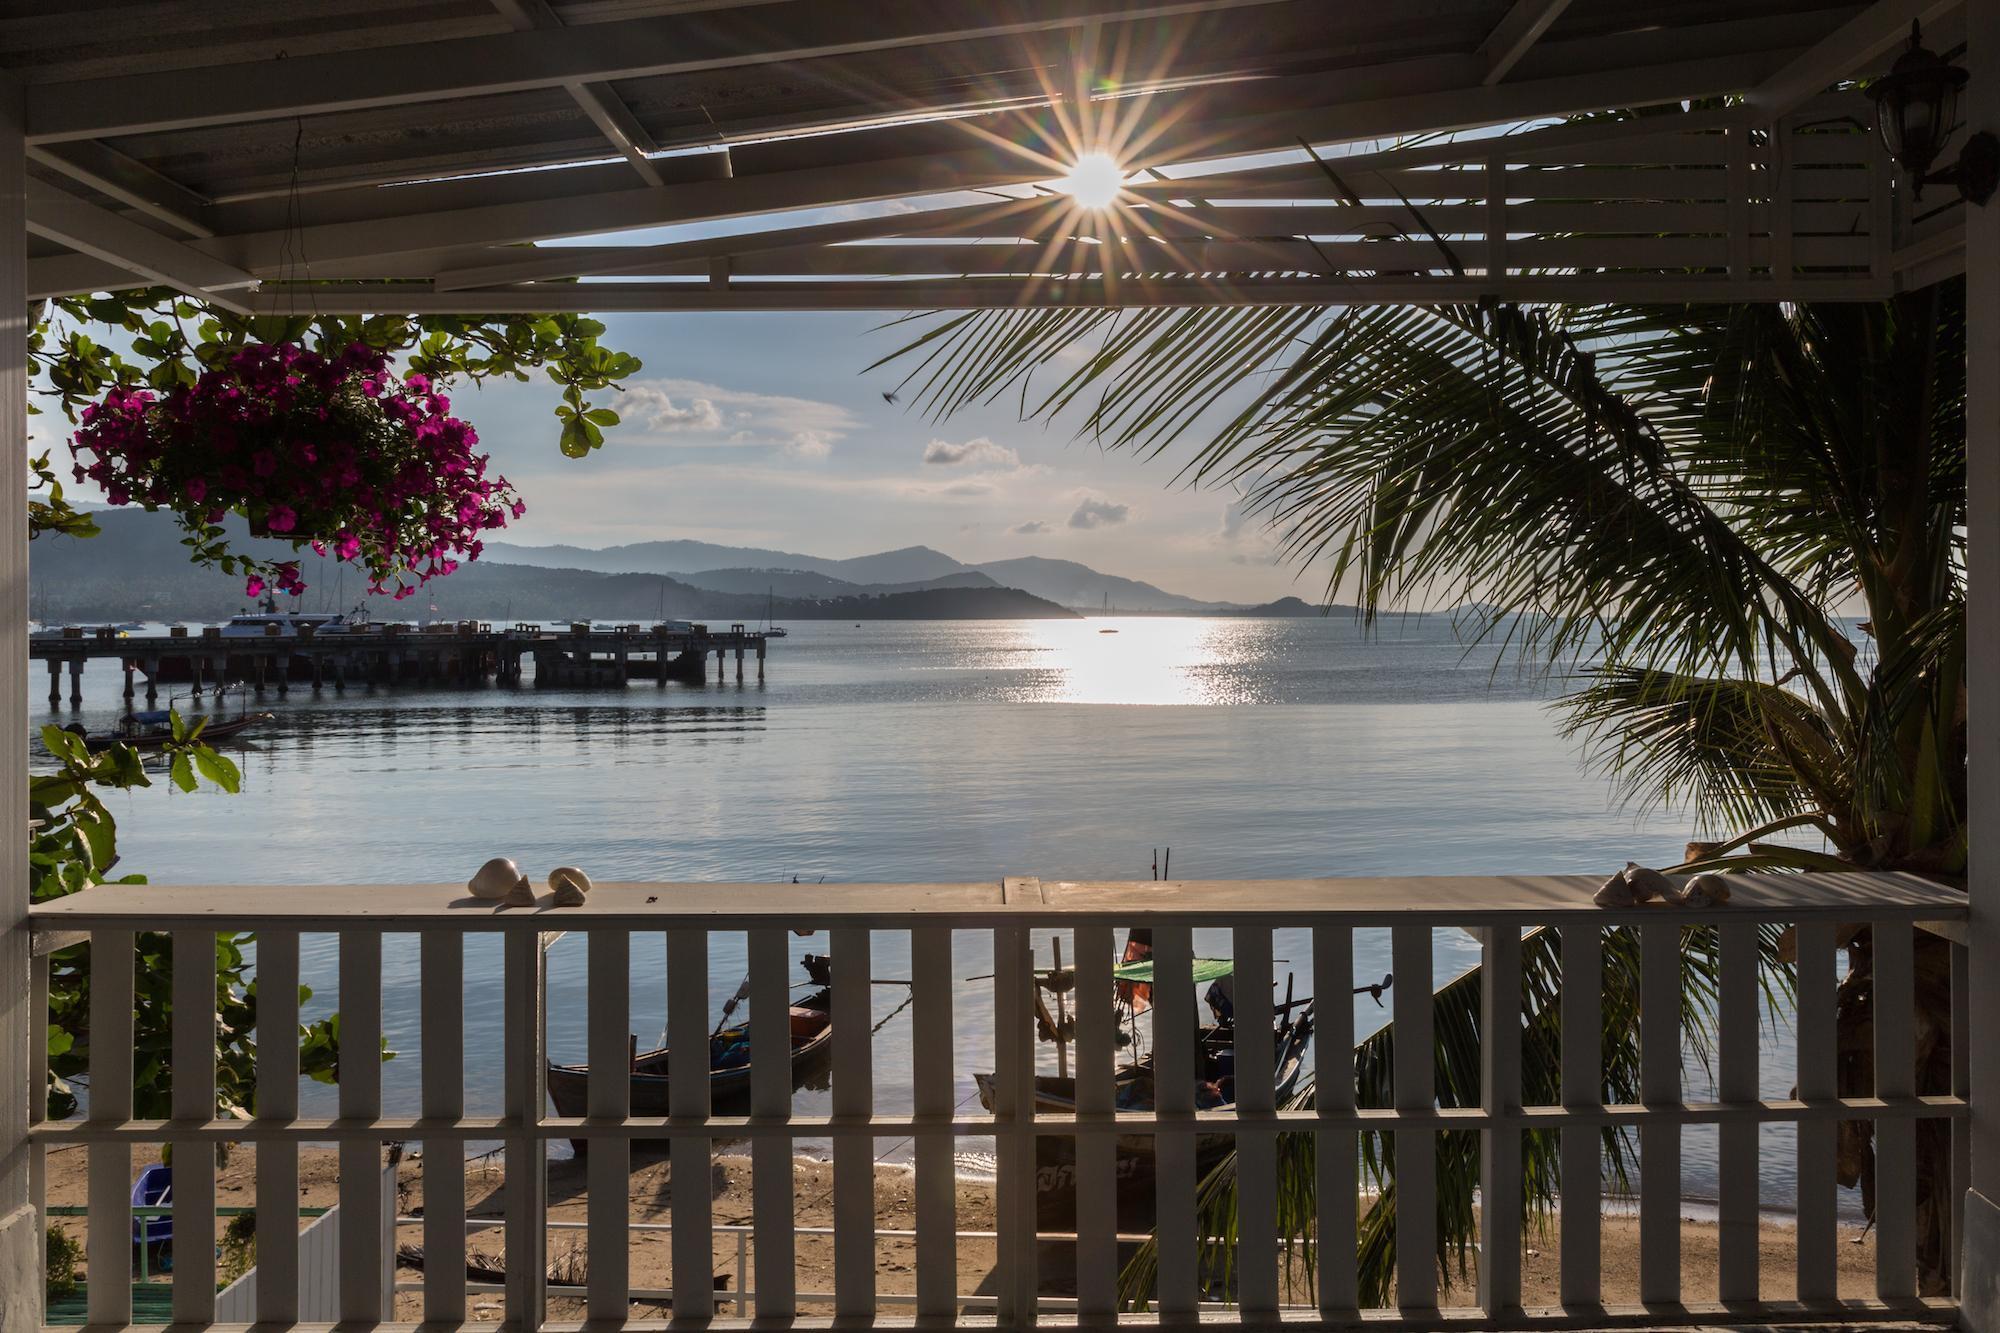 Exquisite Seaside Studio near Big Buddha Exquisite Seaside Studio near Big Buddha